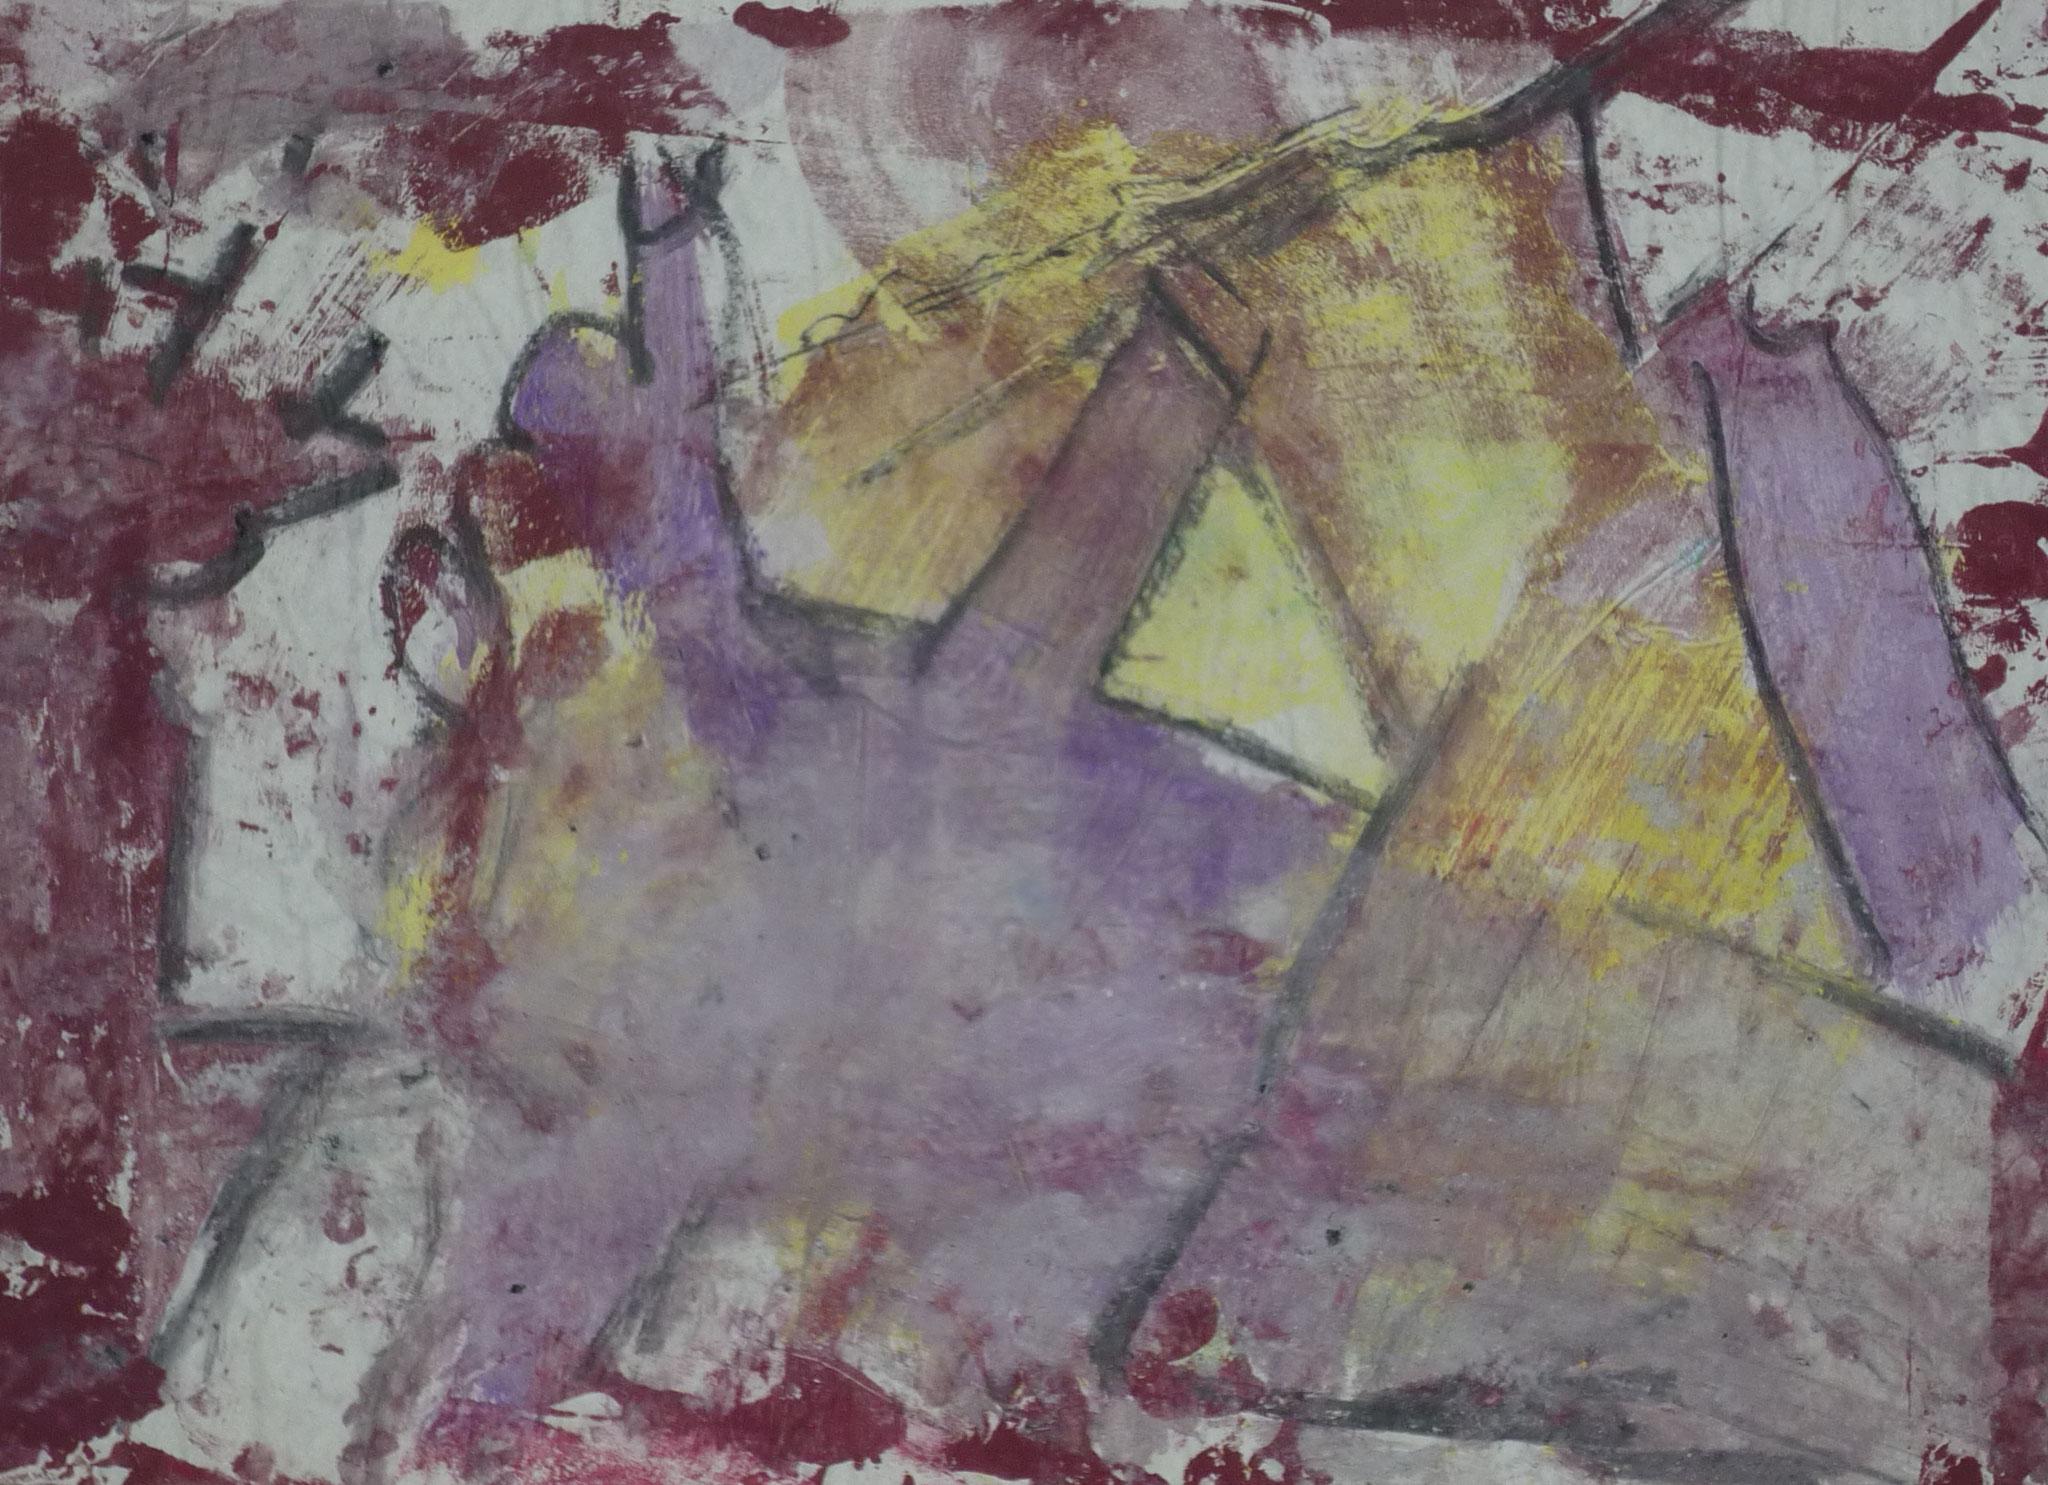 Kleine Monster, 2001, 50x37cm, Transparentpapier